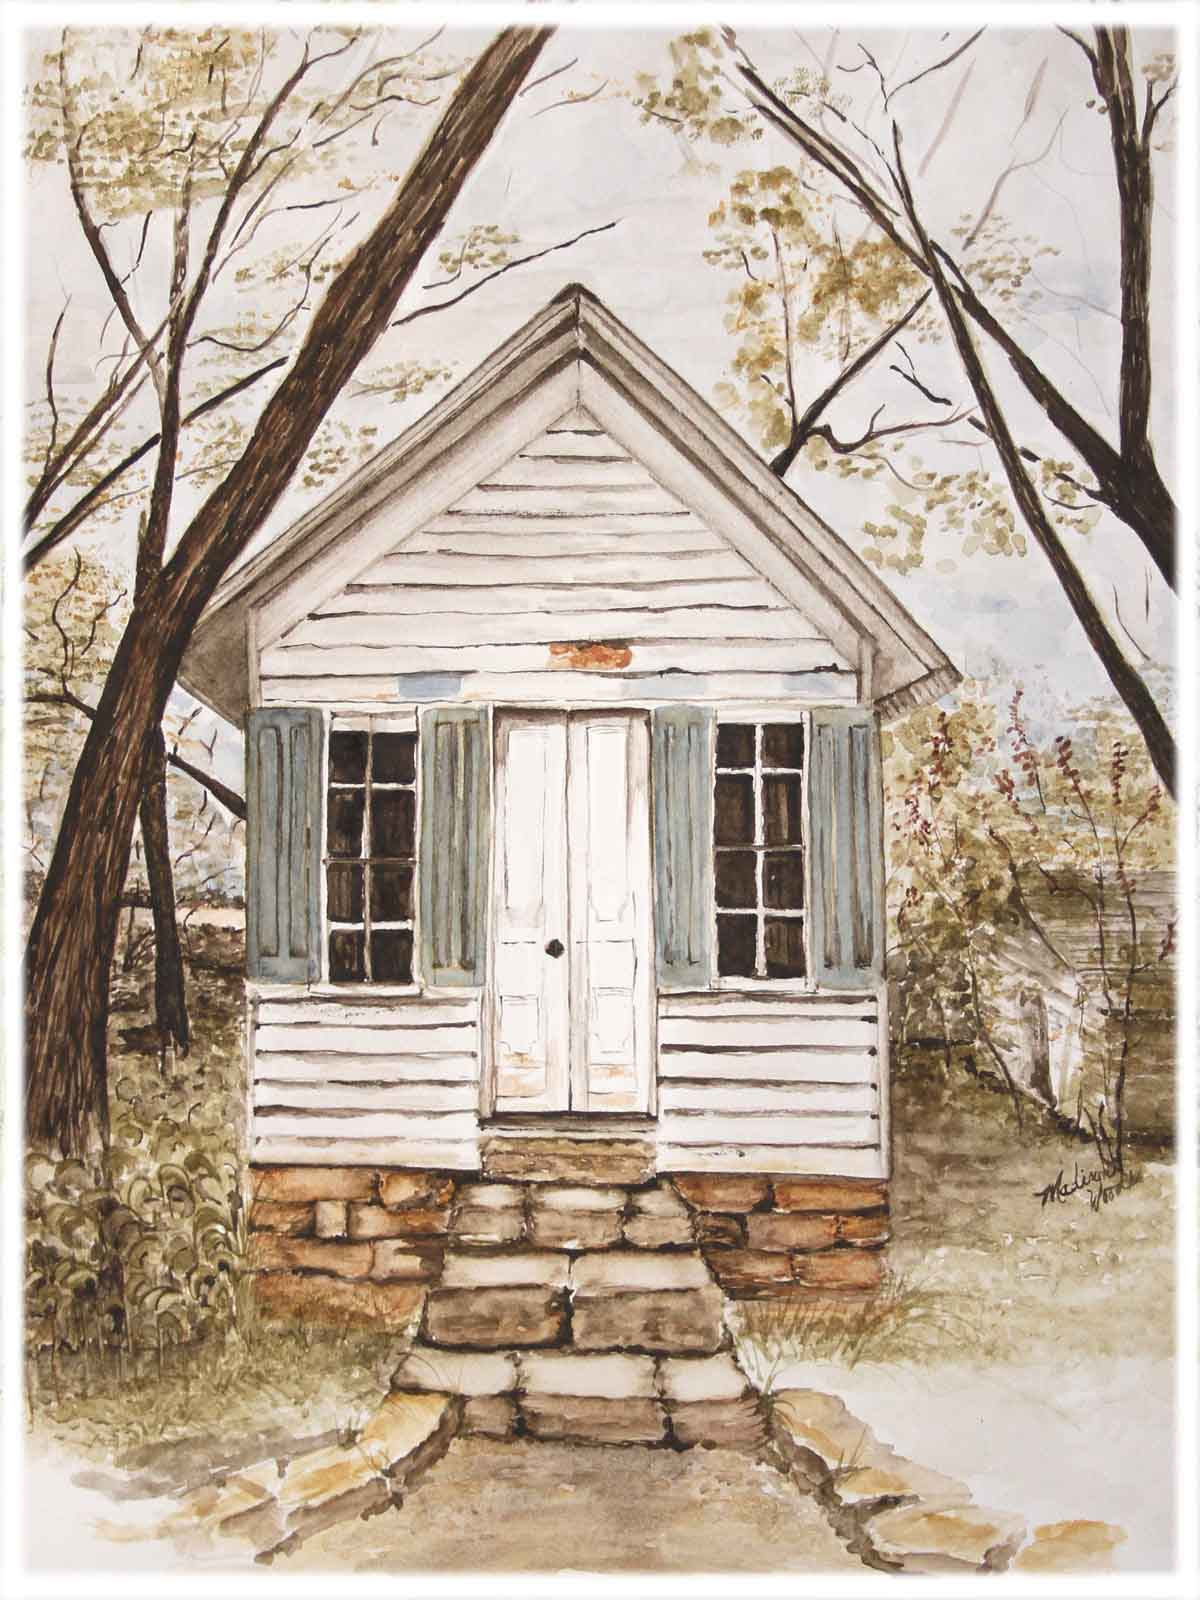 Arkansas Historical Building: Dr. Carter's Office in Ozark Pigments